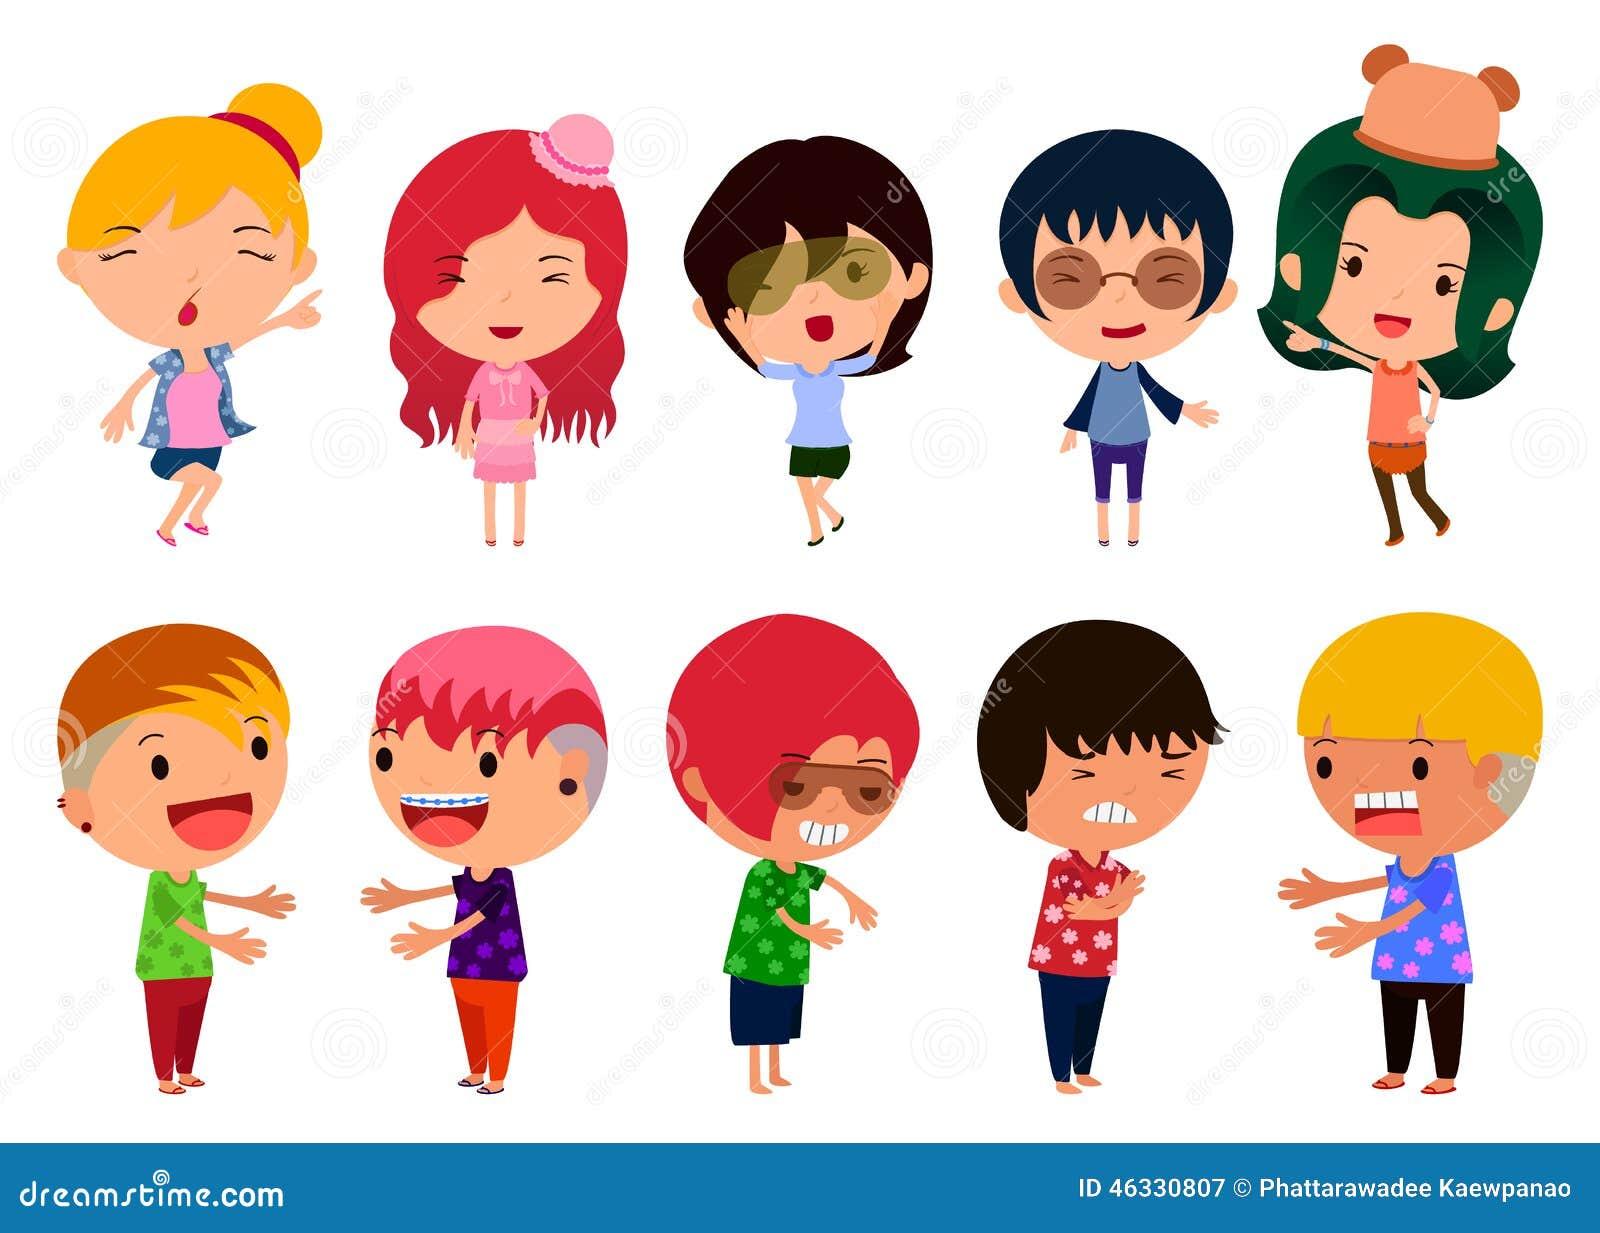 Character Design Set : Character design set stock vector illustration of